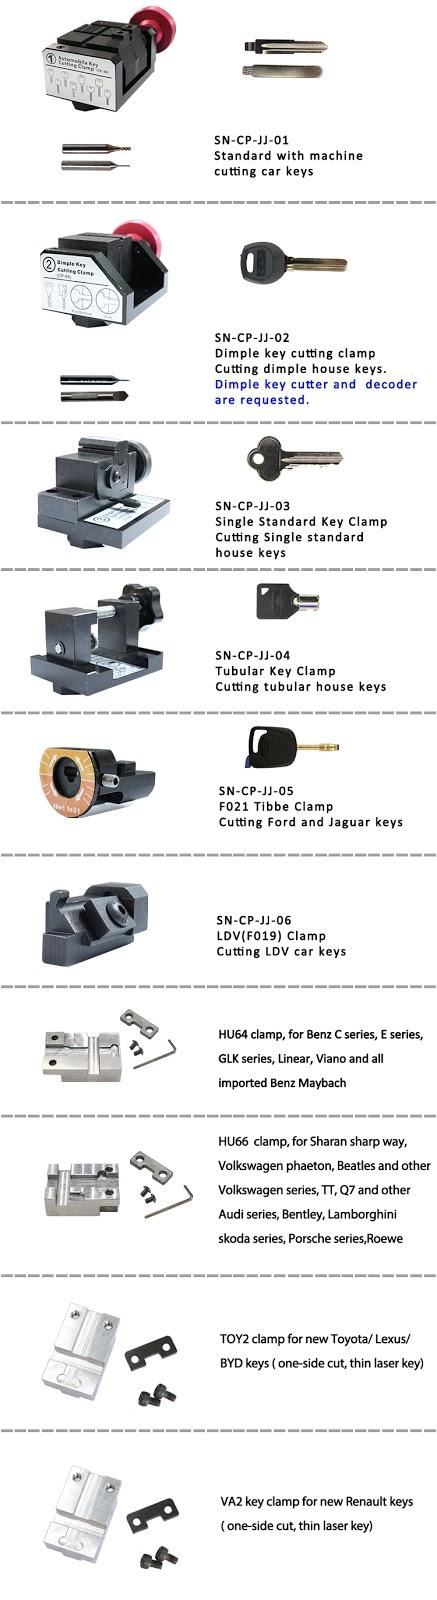 sec-e9-key-clamps